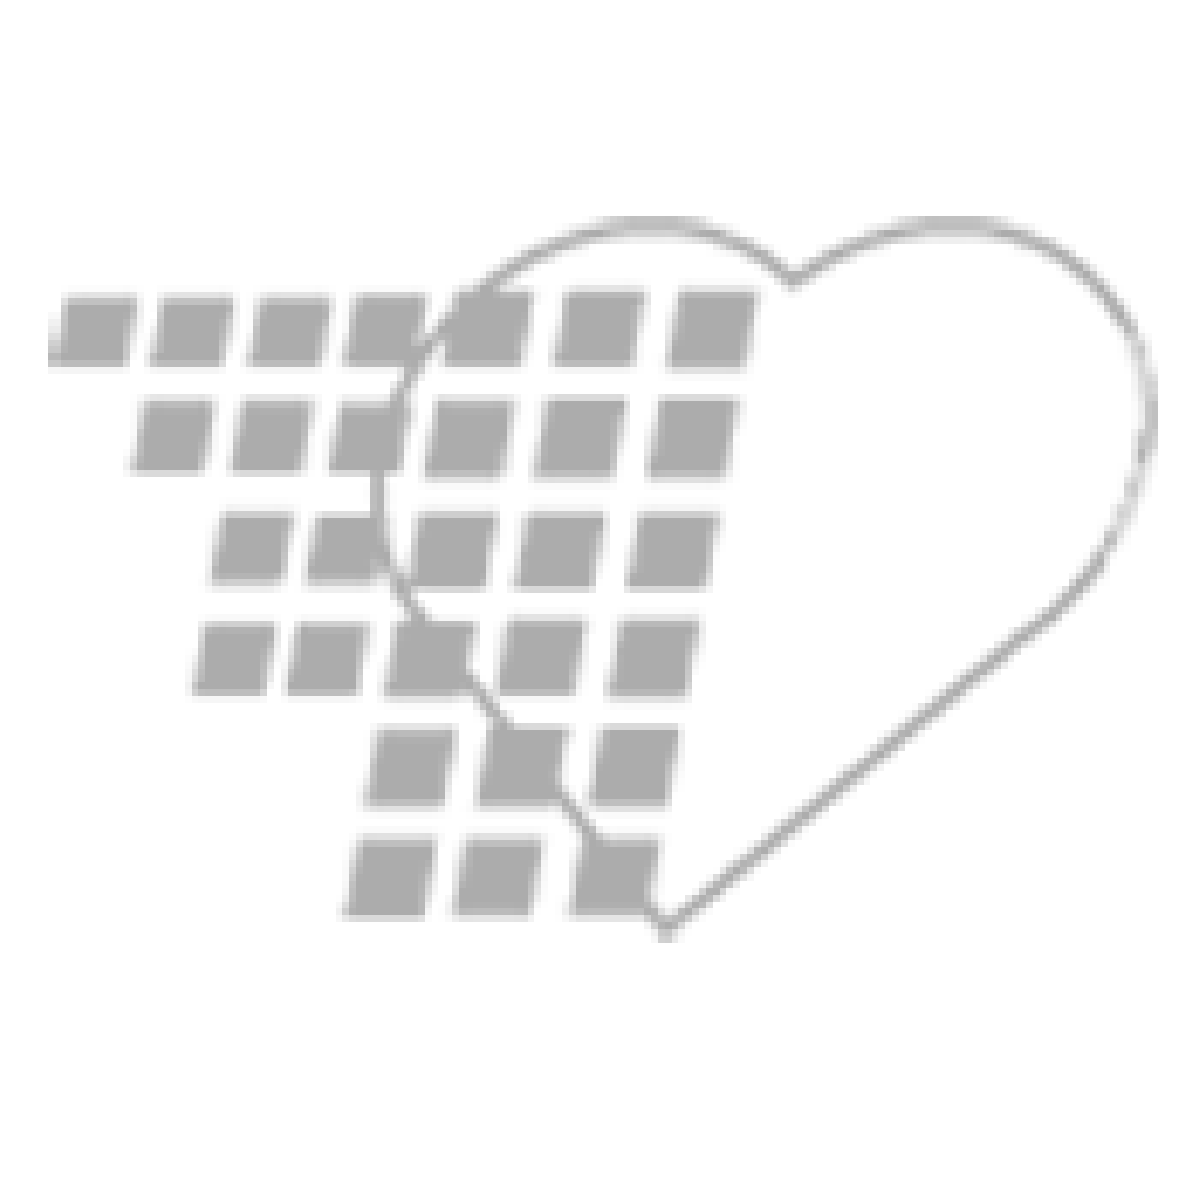 07-71-4832P Suction Catheter Kits Sterile